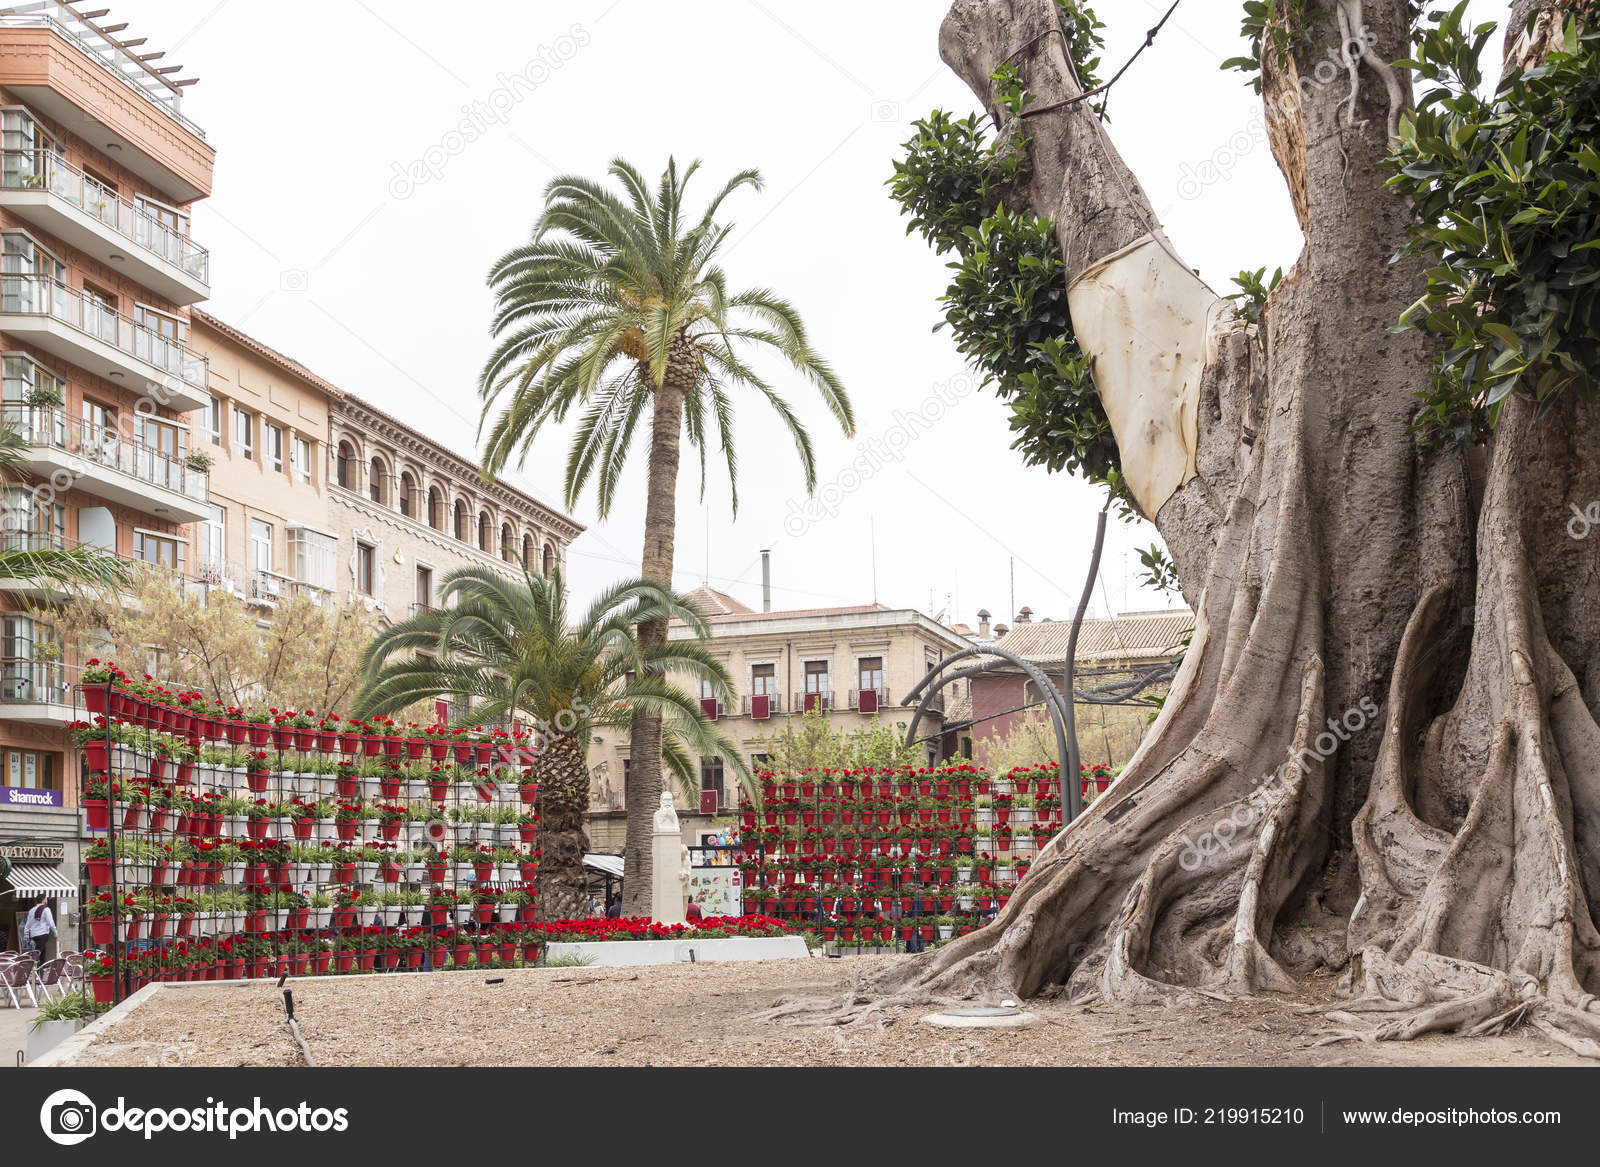 Plaza Santo Domingo Murcia Spring Festivities 2018 Structure Pots